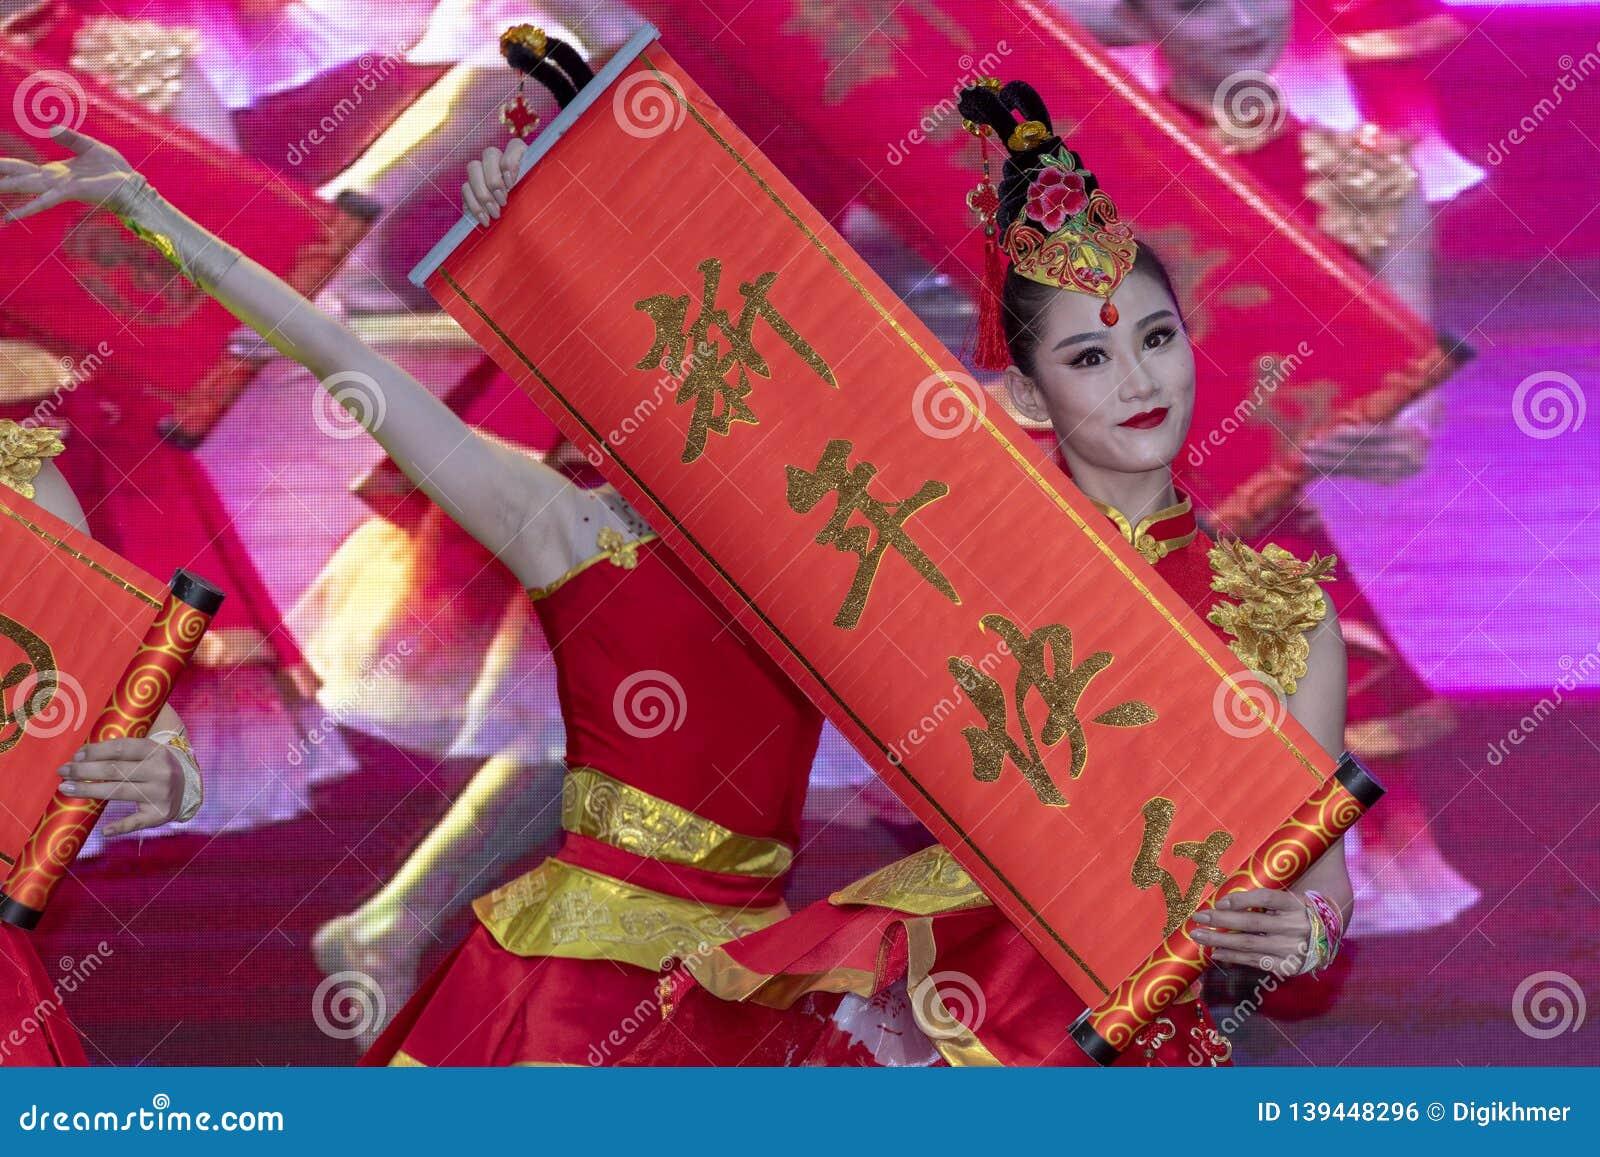 Chinese New Year 2019 - Dance performance